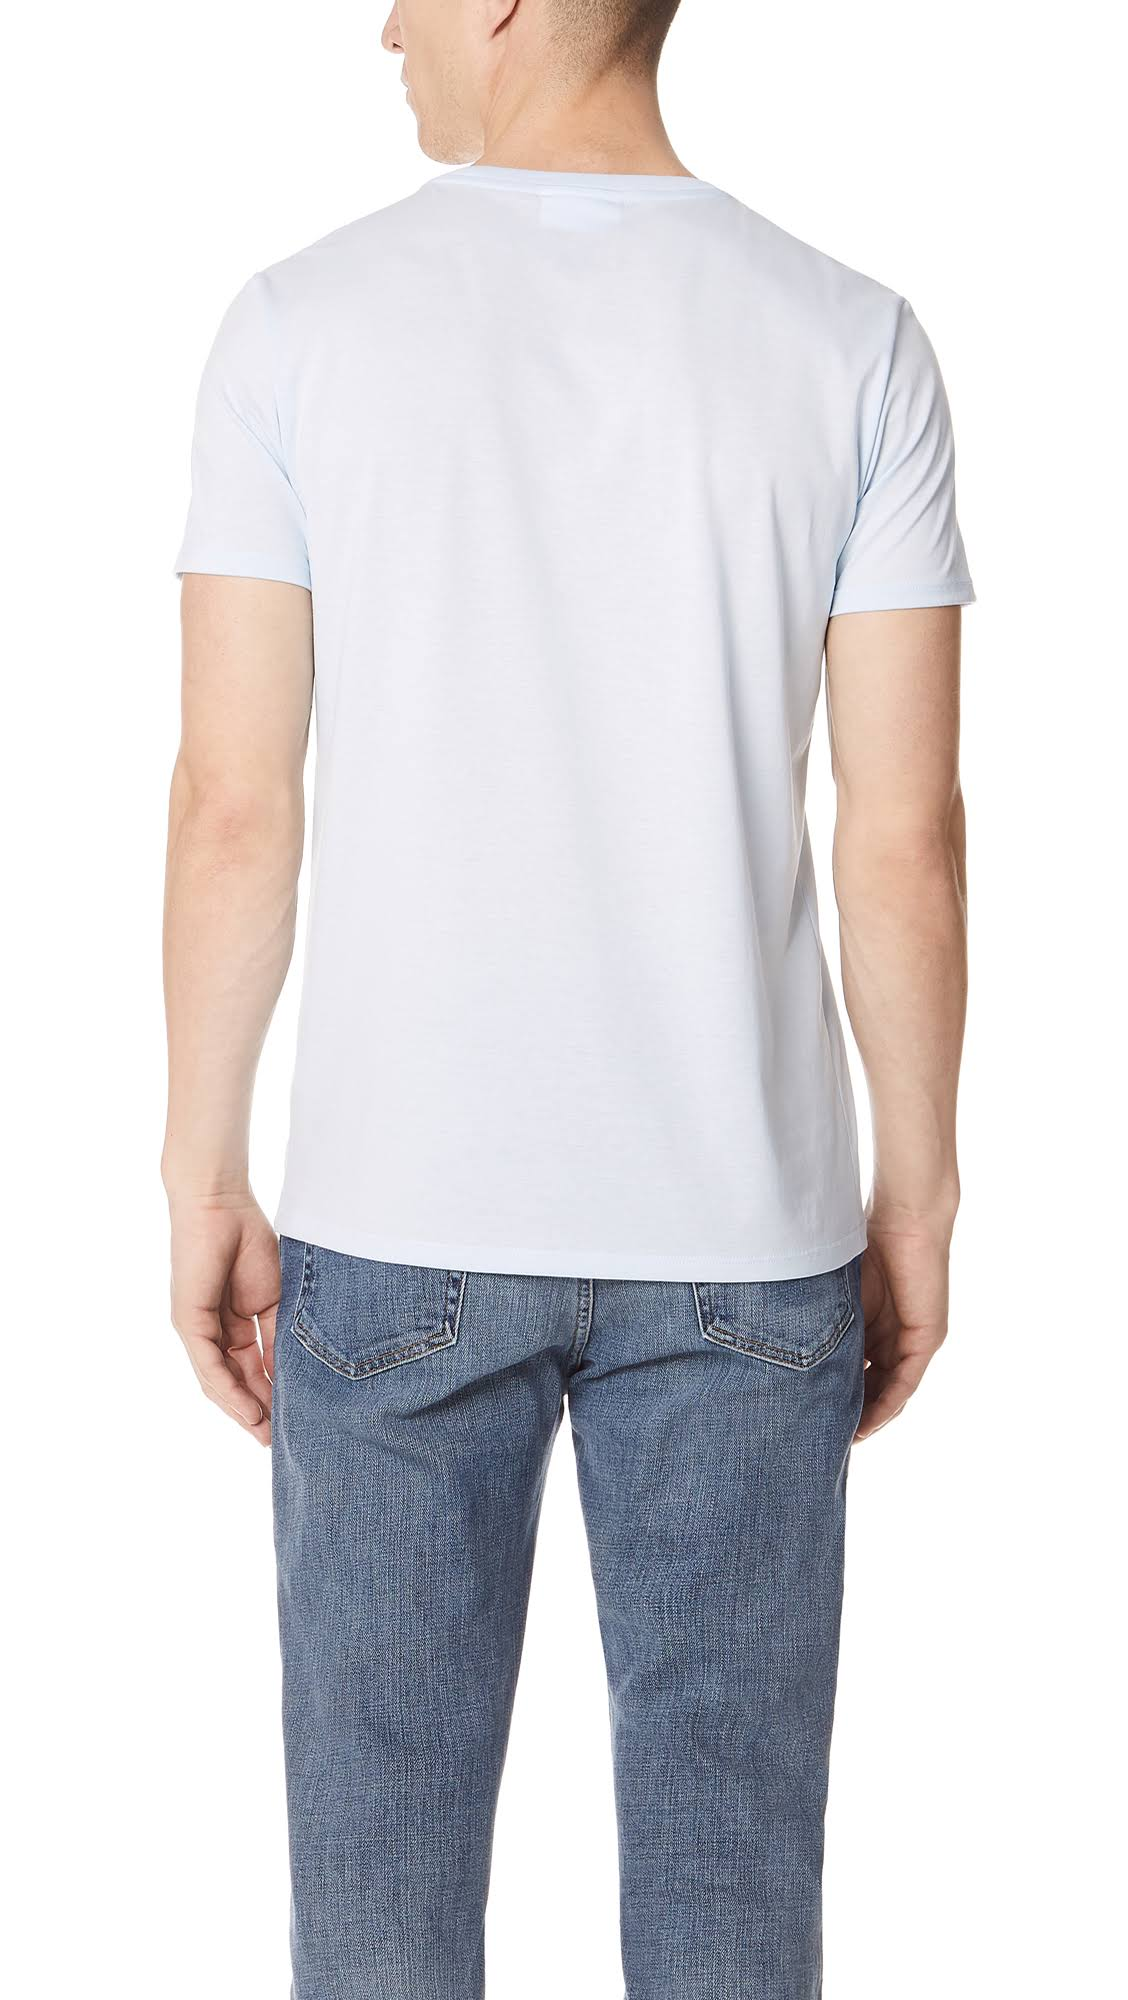 shirt Herren Normales T Neck Pima Blau Crew Cotton Lacoste S w0dBxAvqv